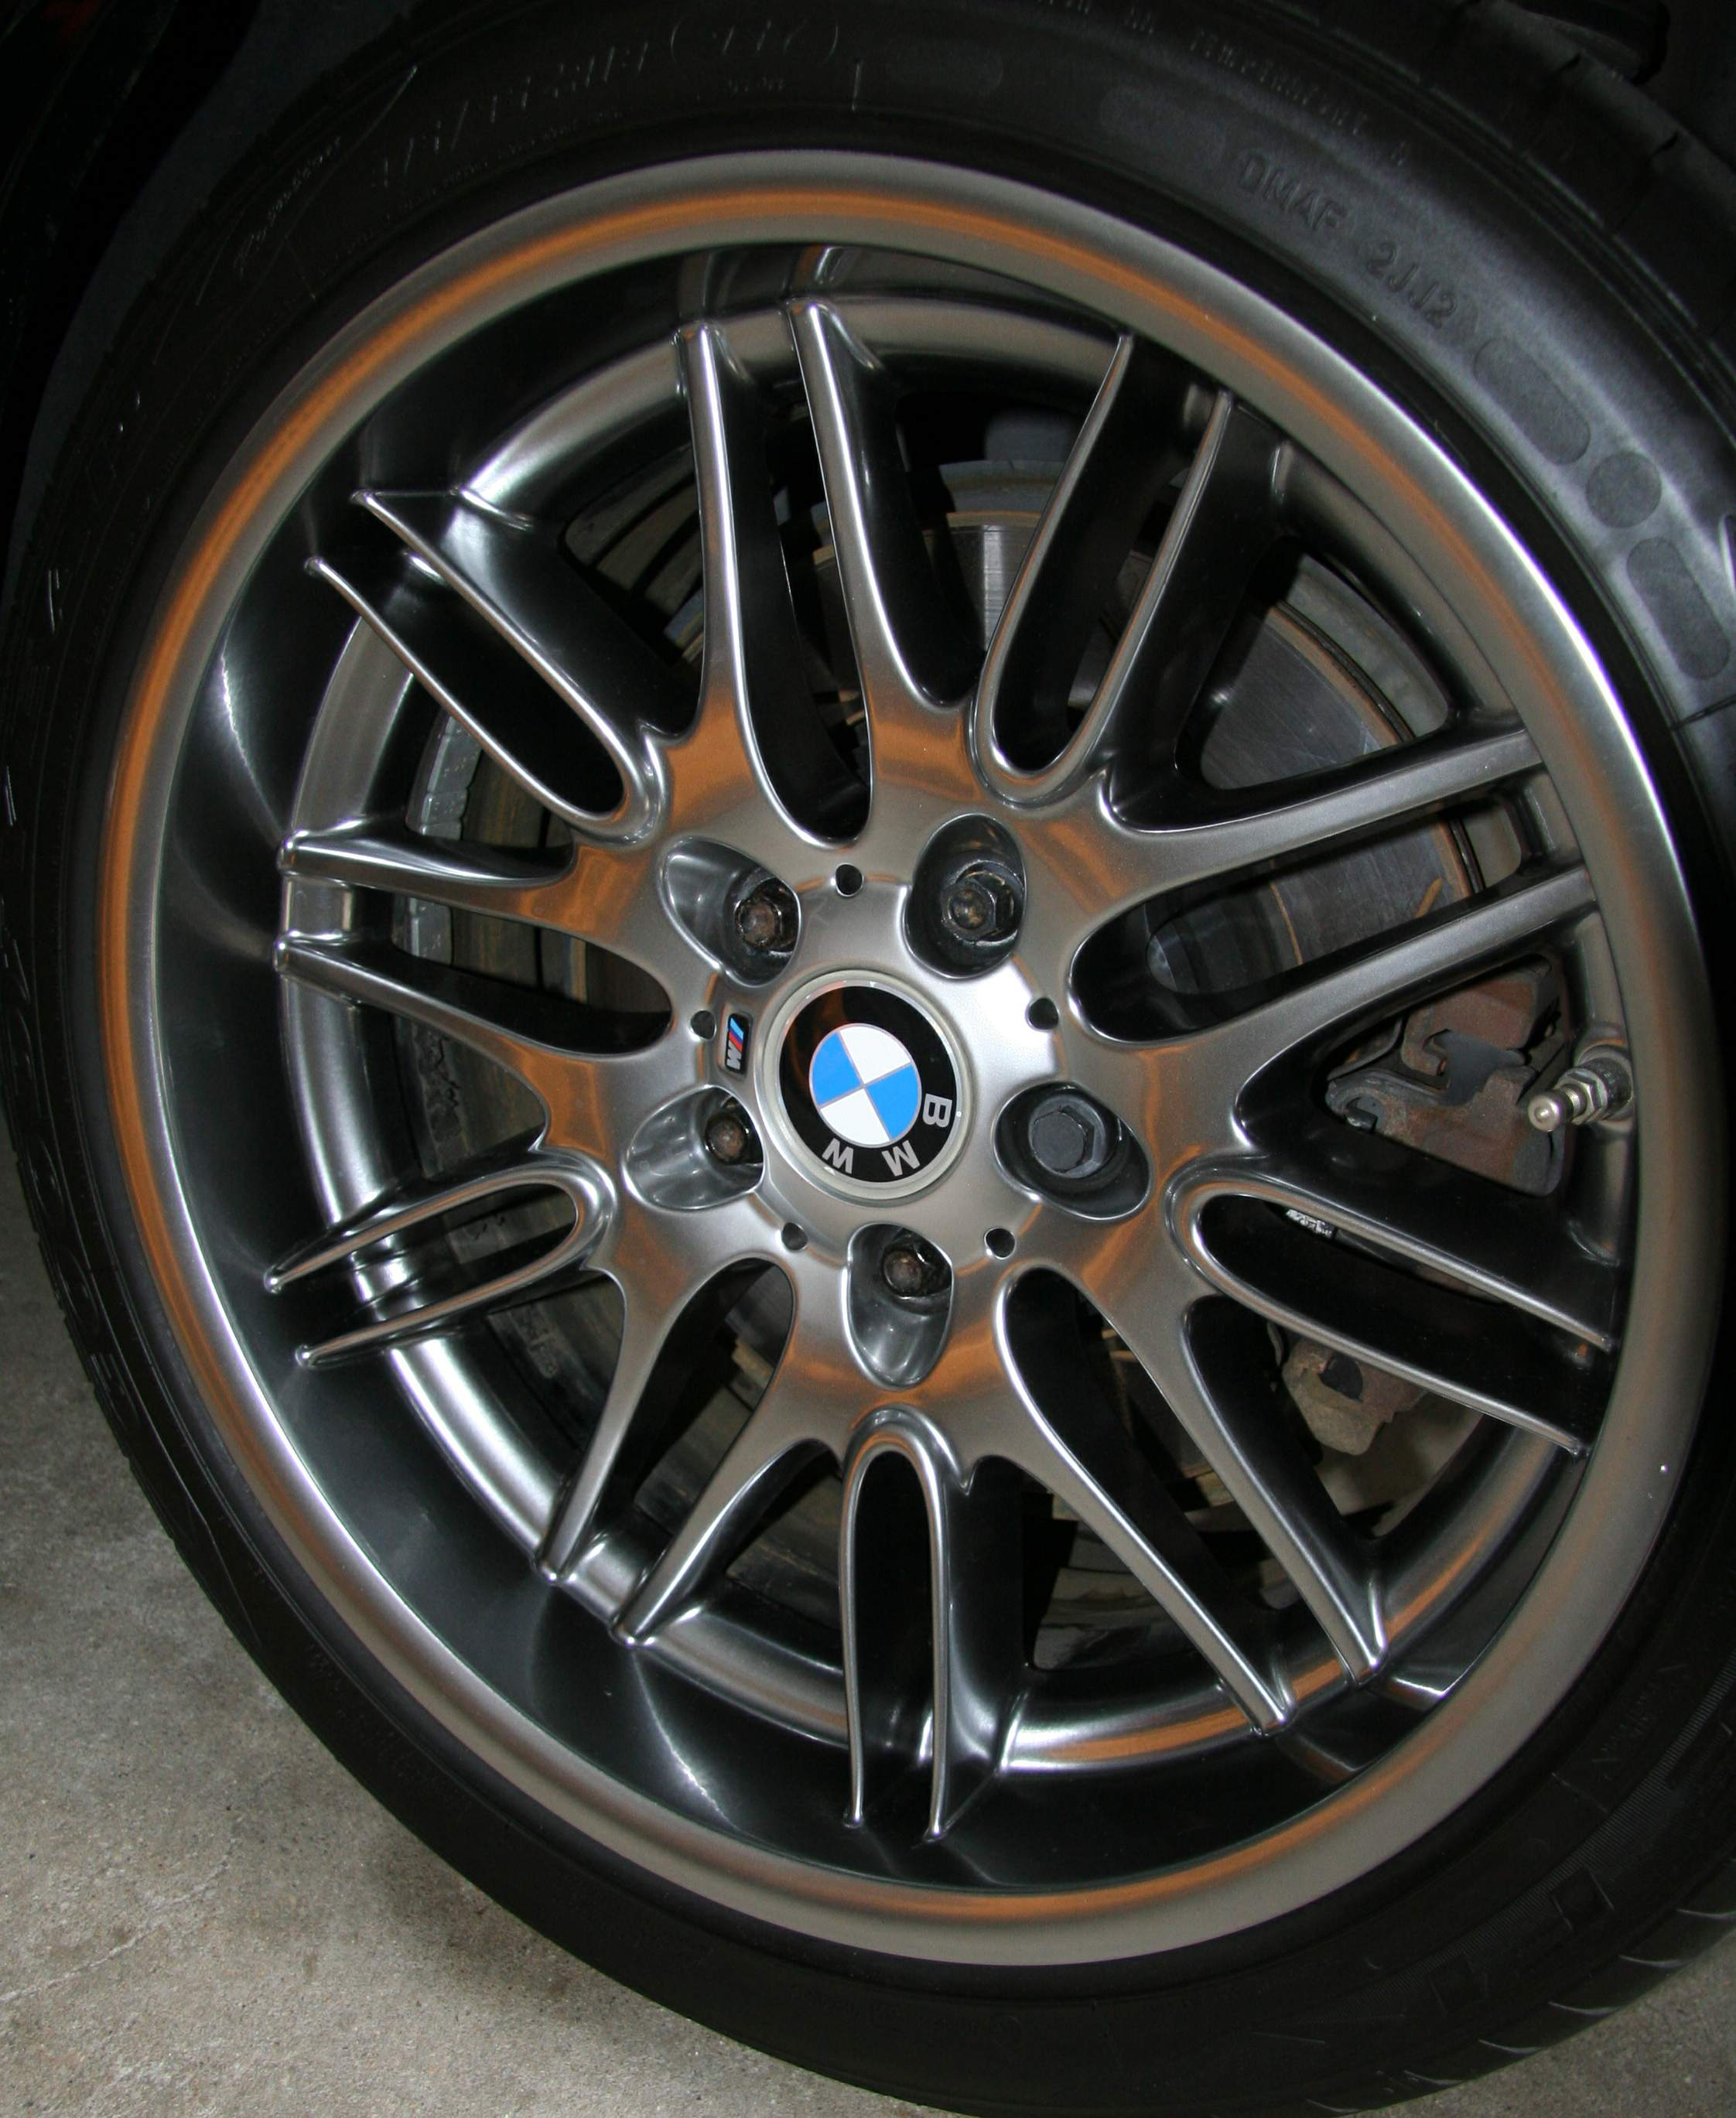 My M5 Oem Shadow Chrome Wheels Quest For Refurbish